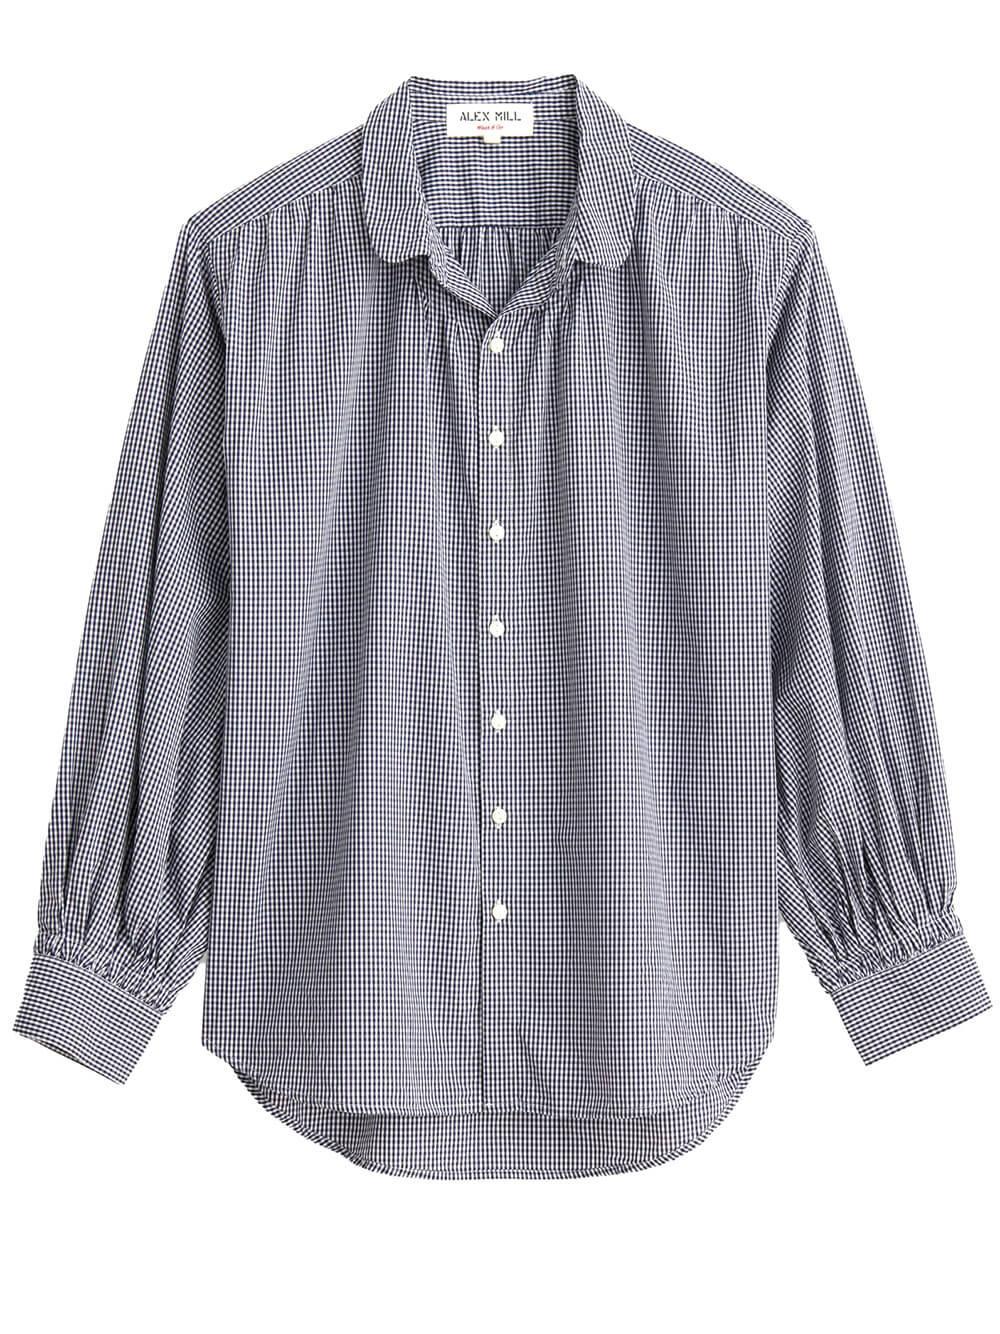 Kit Shirt In Mini Gingham Item # 216-WS013-2742